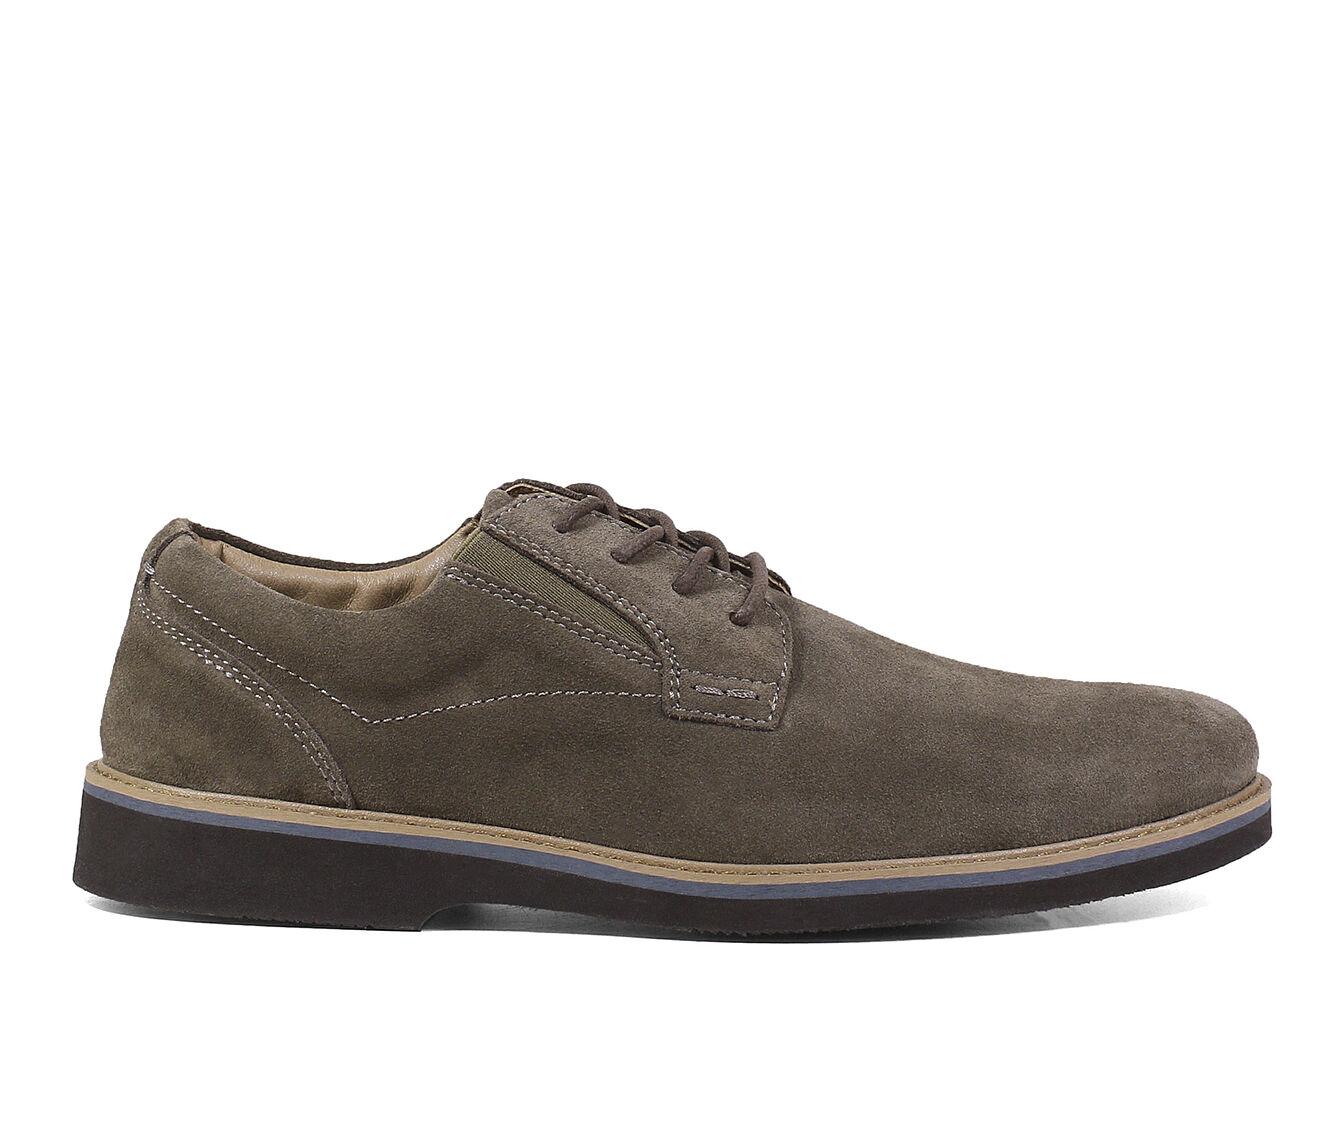 Men's Nunn Bush Barklay Plain Toe Oxford Dress Shoes Mocha